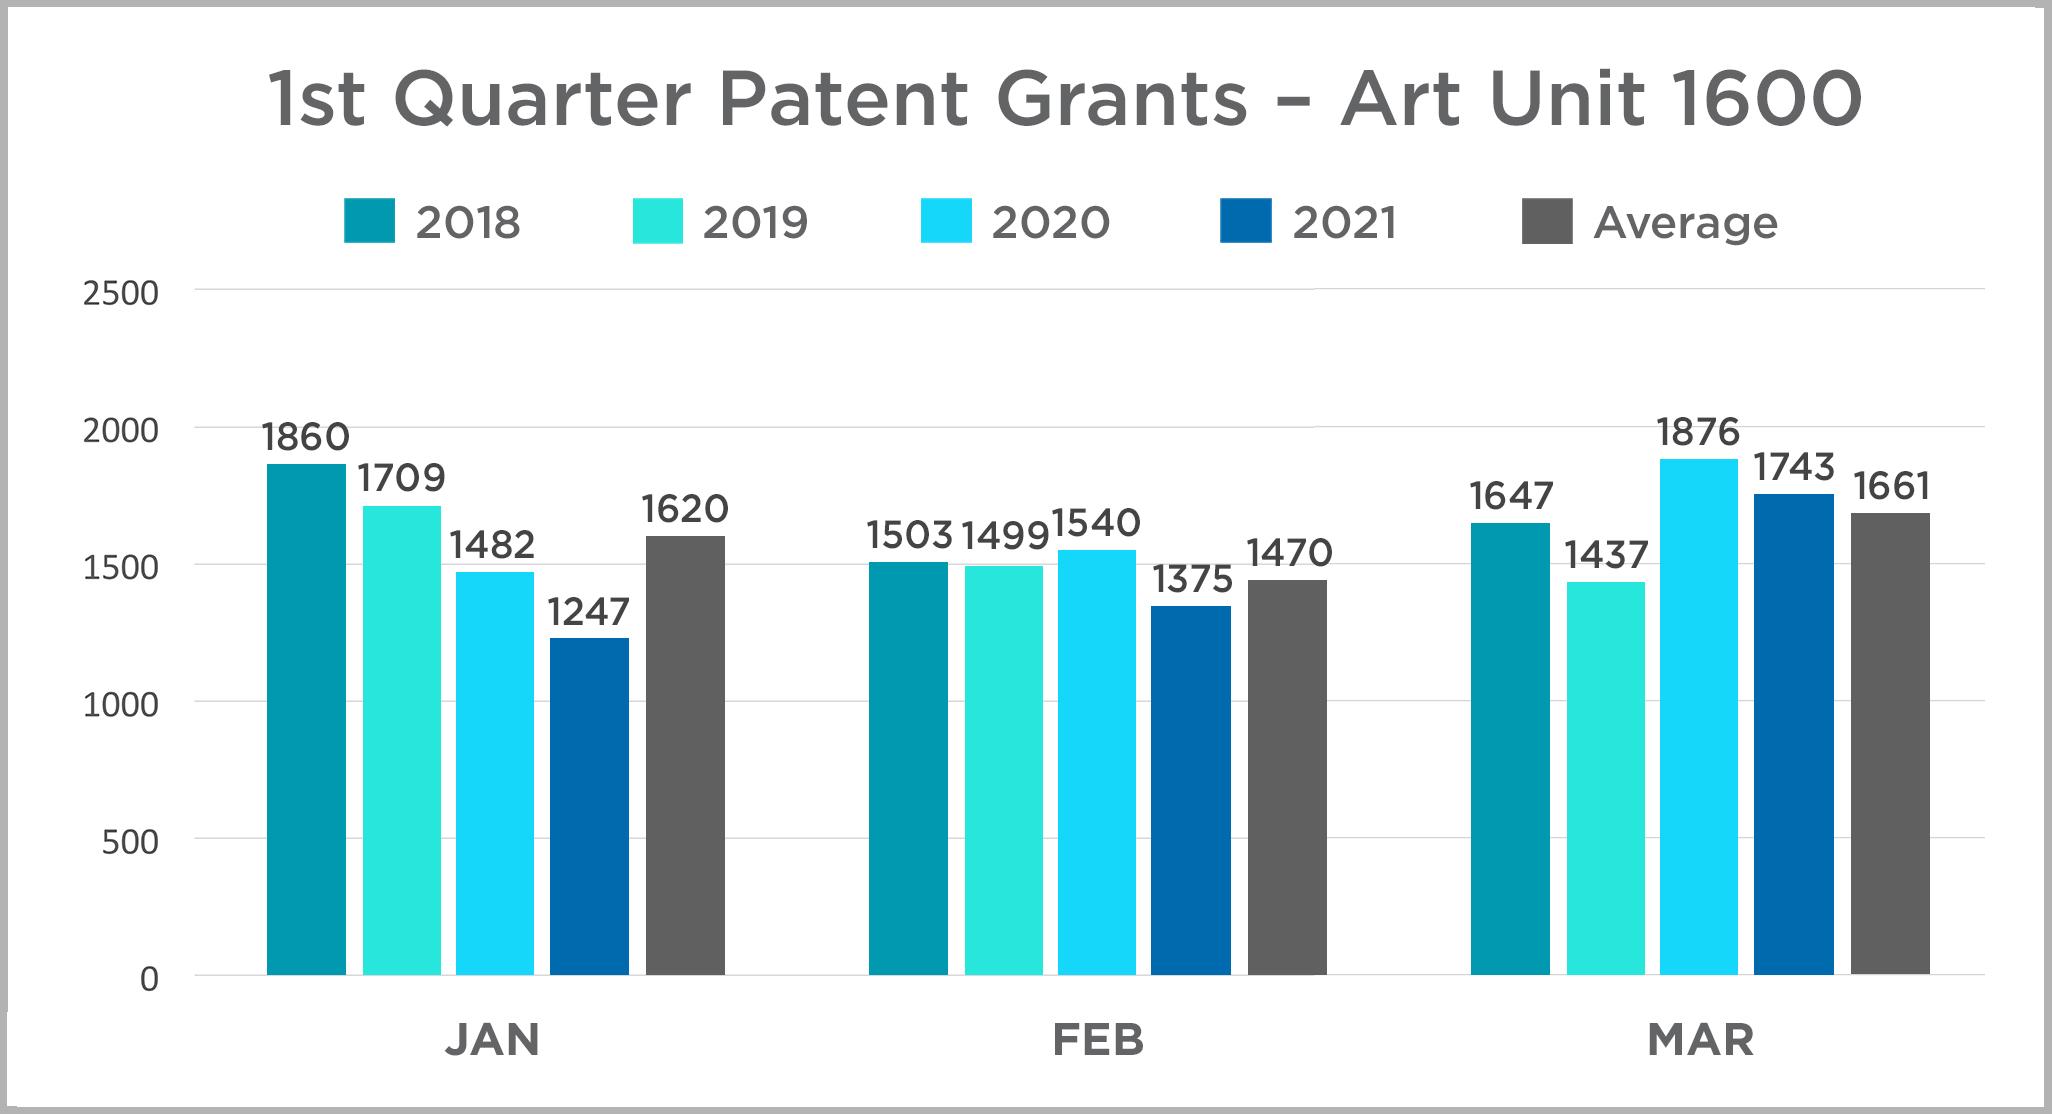 1st quarter 2021 patent grants - Art Unit 1600